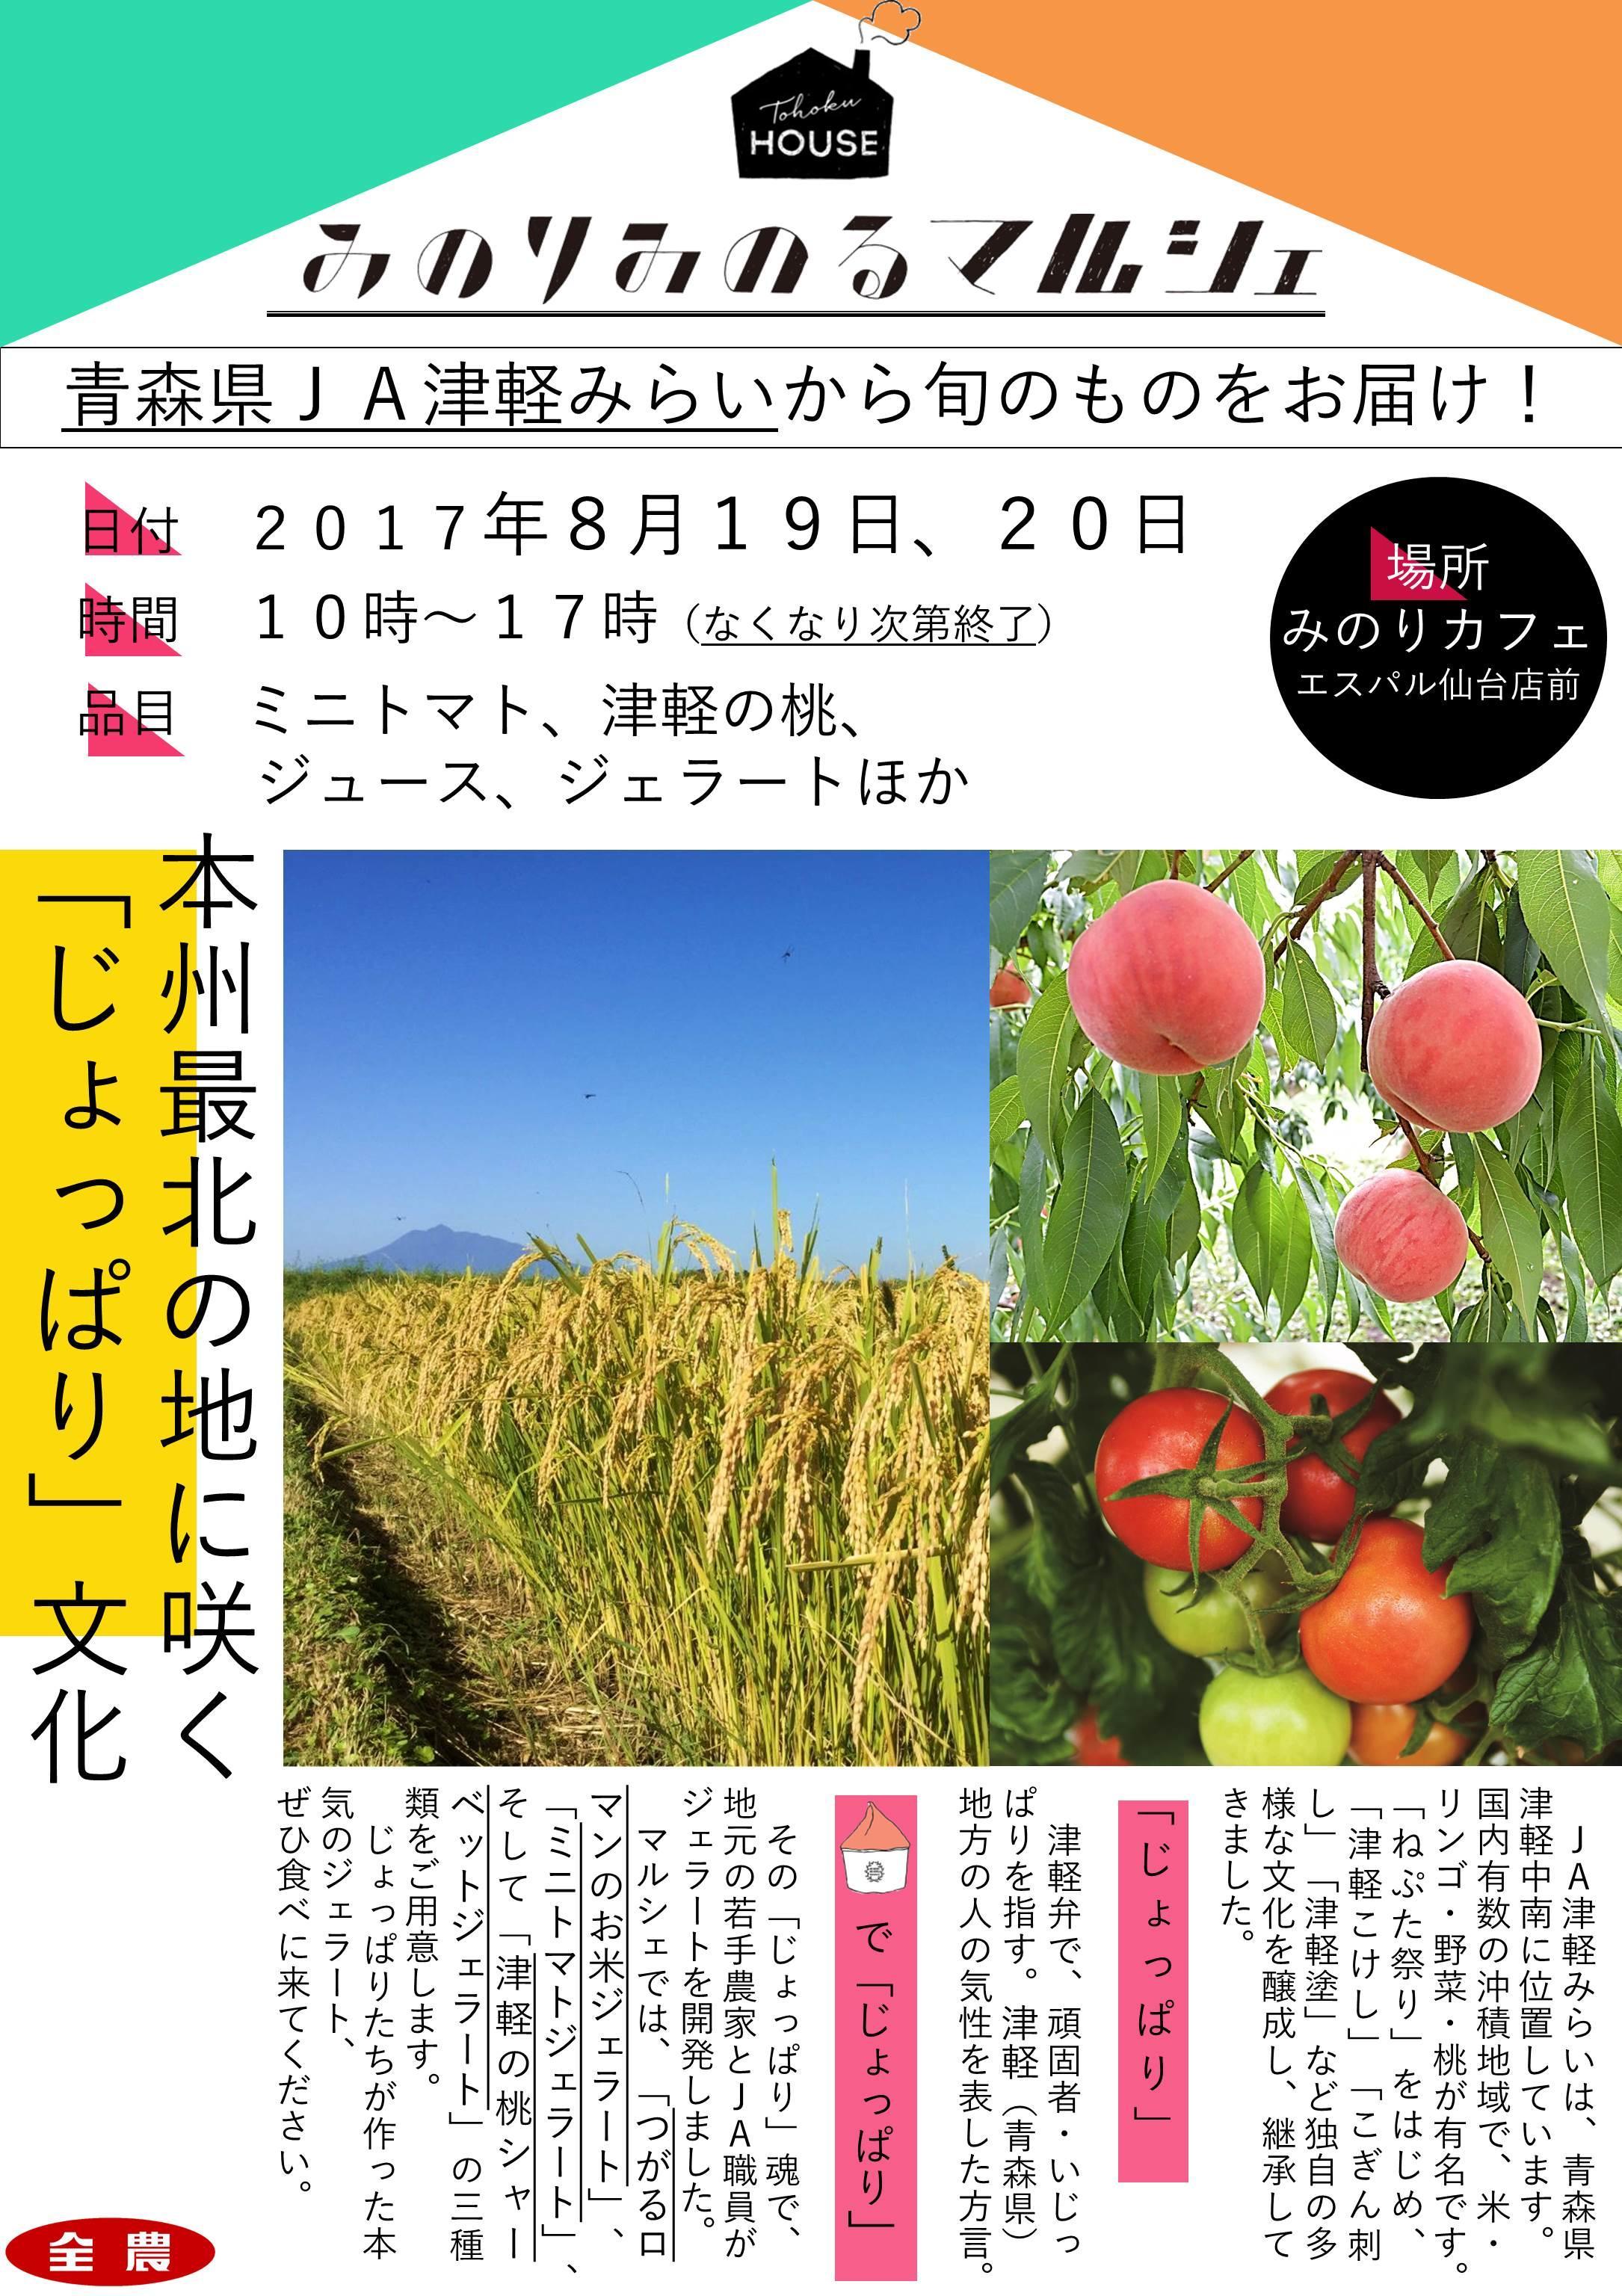 02201707_JA津軽みらい_告知ポスター - JPEG.jpg